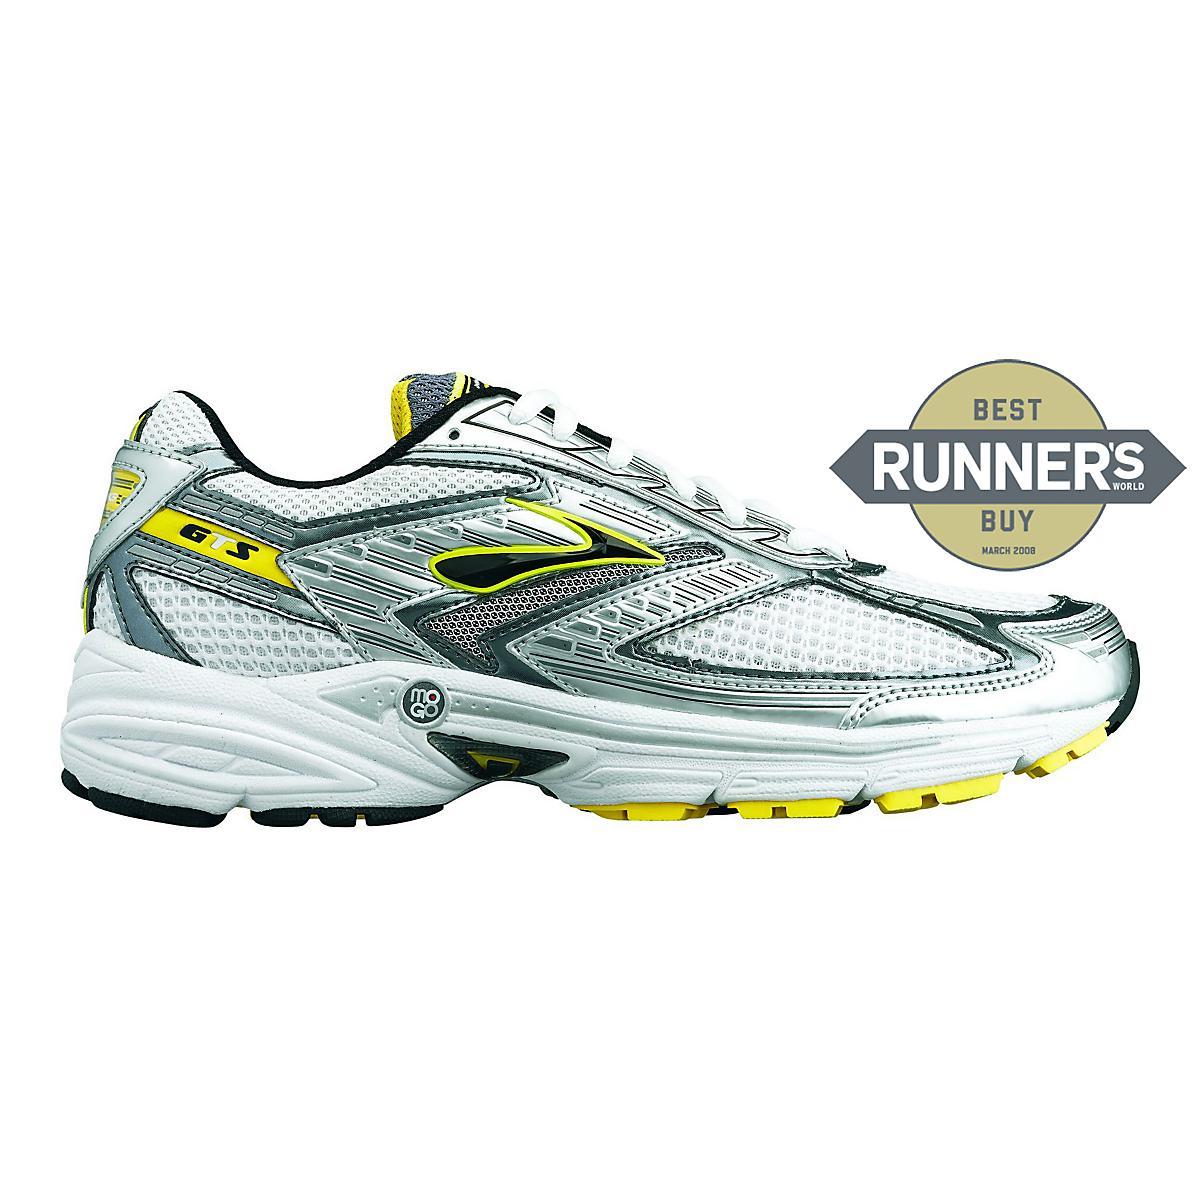 1955c1dbc7fa1 Men s Brooks Running Shoes